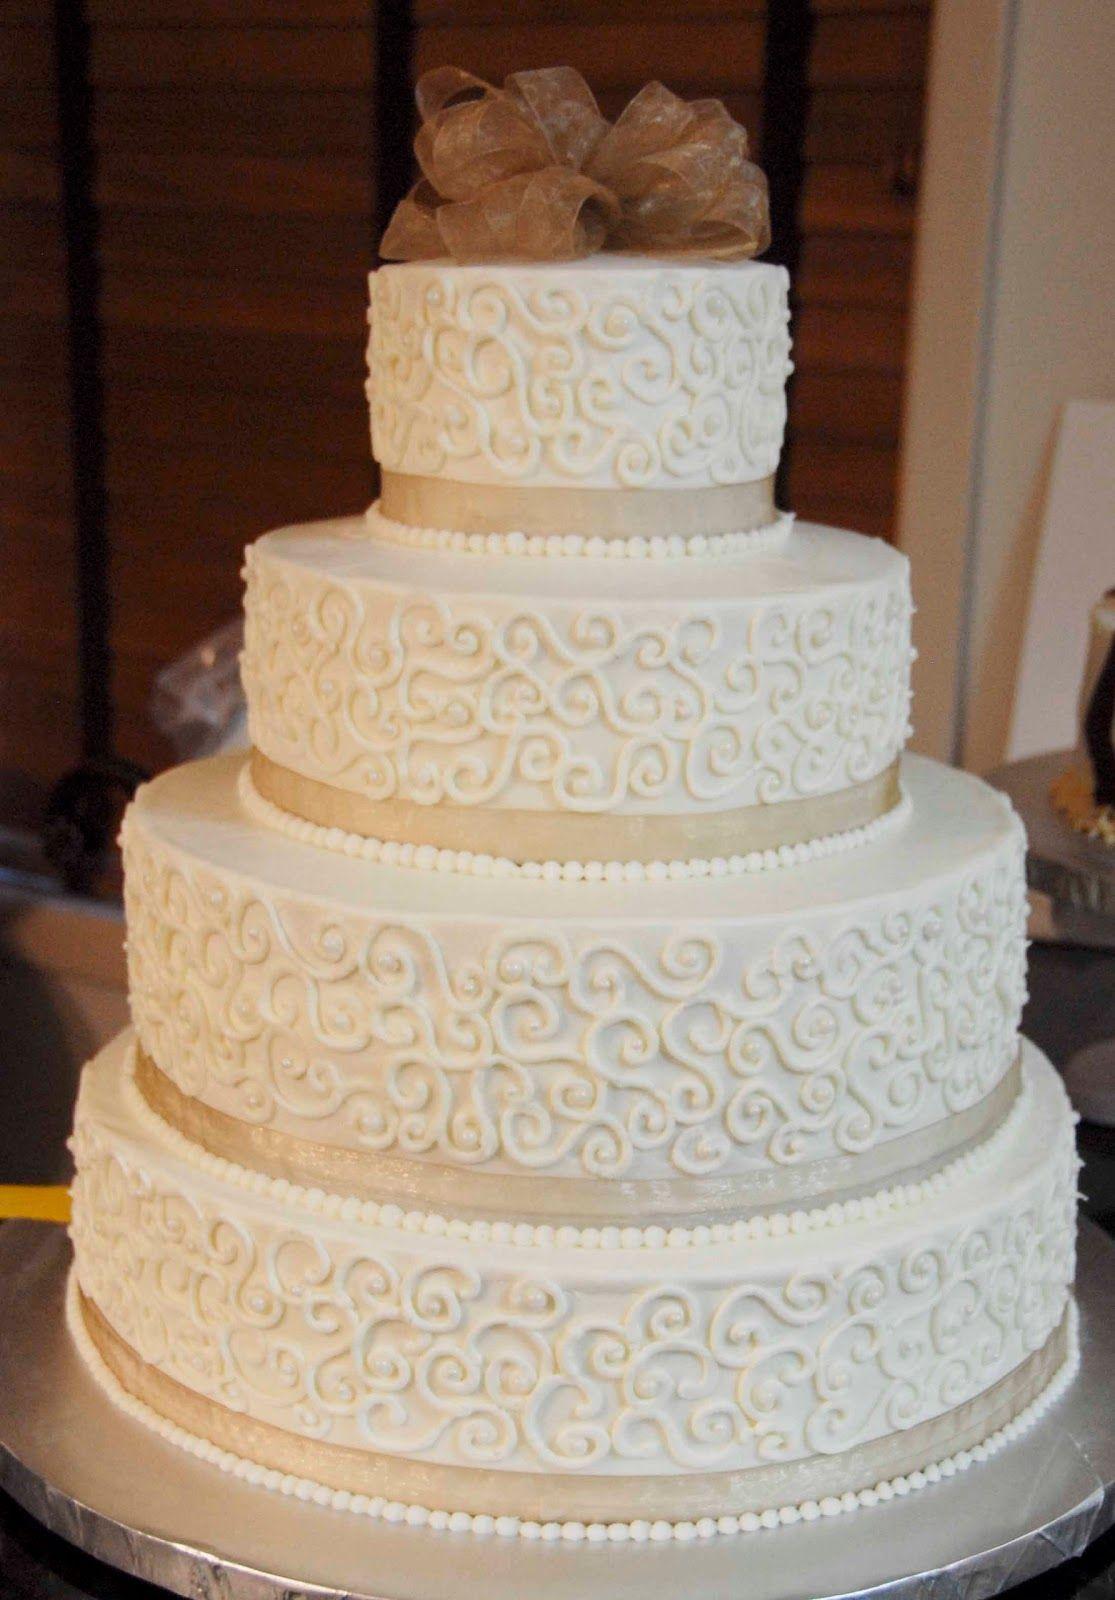 50th wedding anniversary cakes wedding cakes, 1 50th